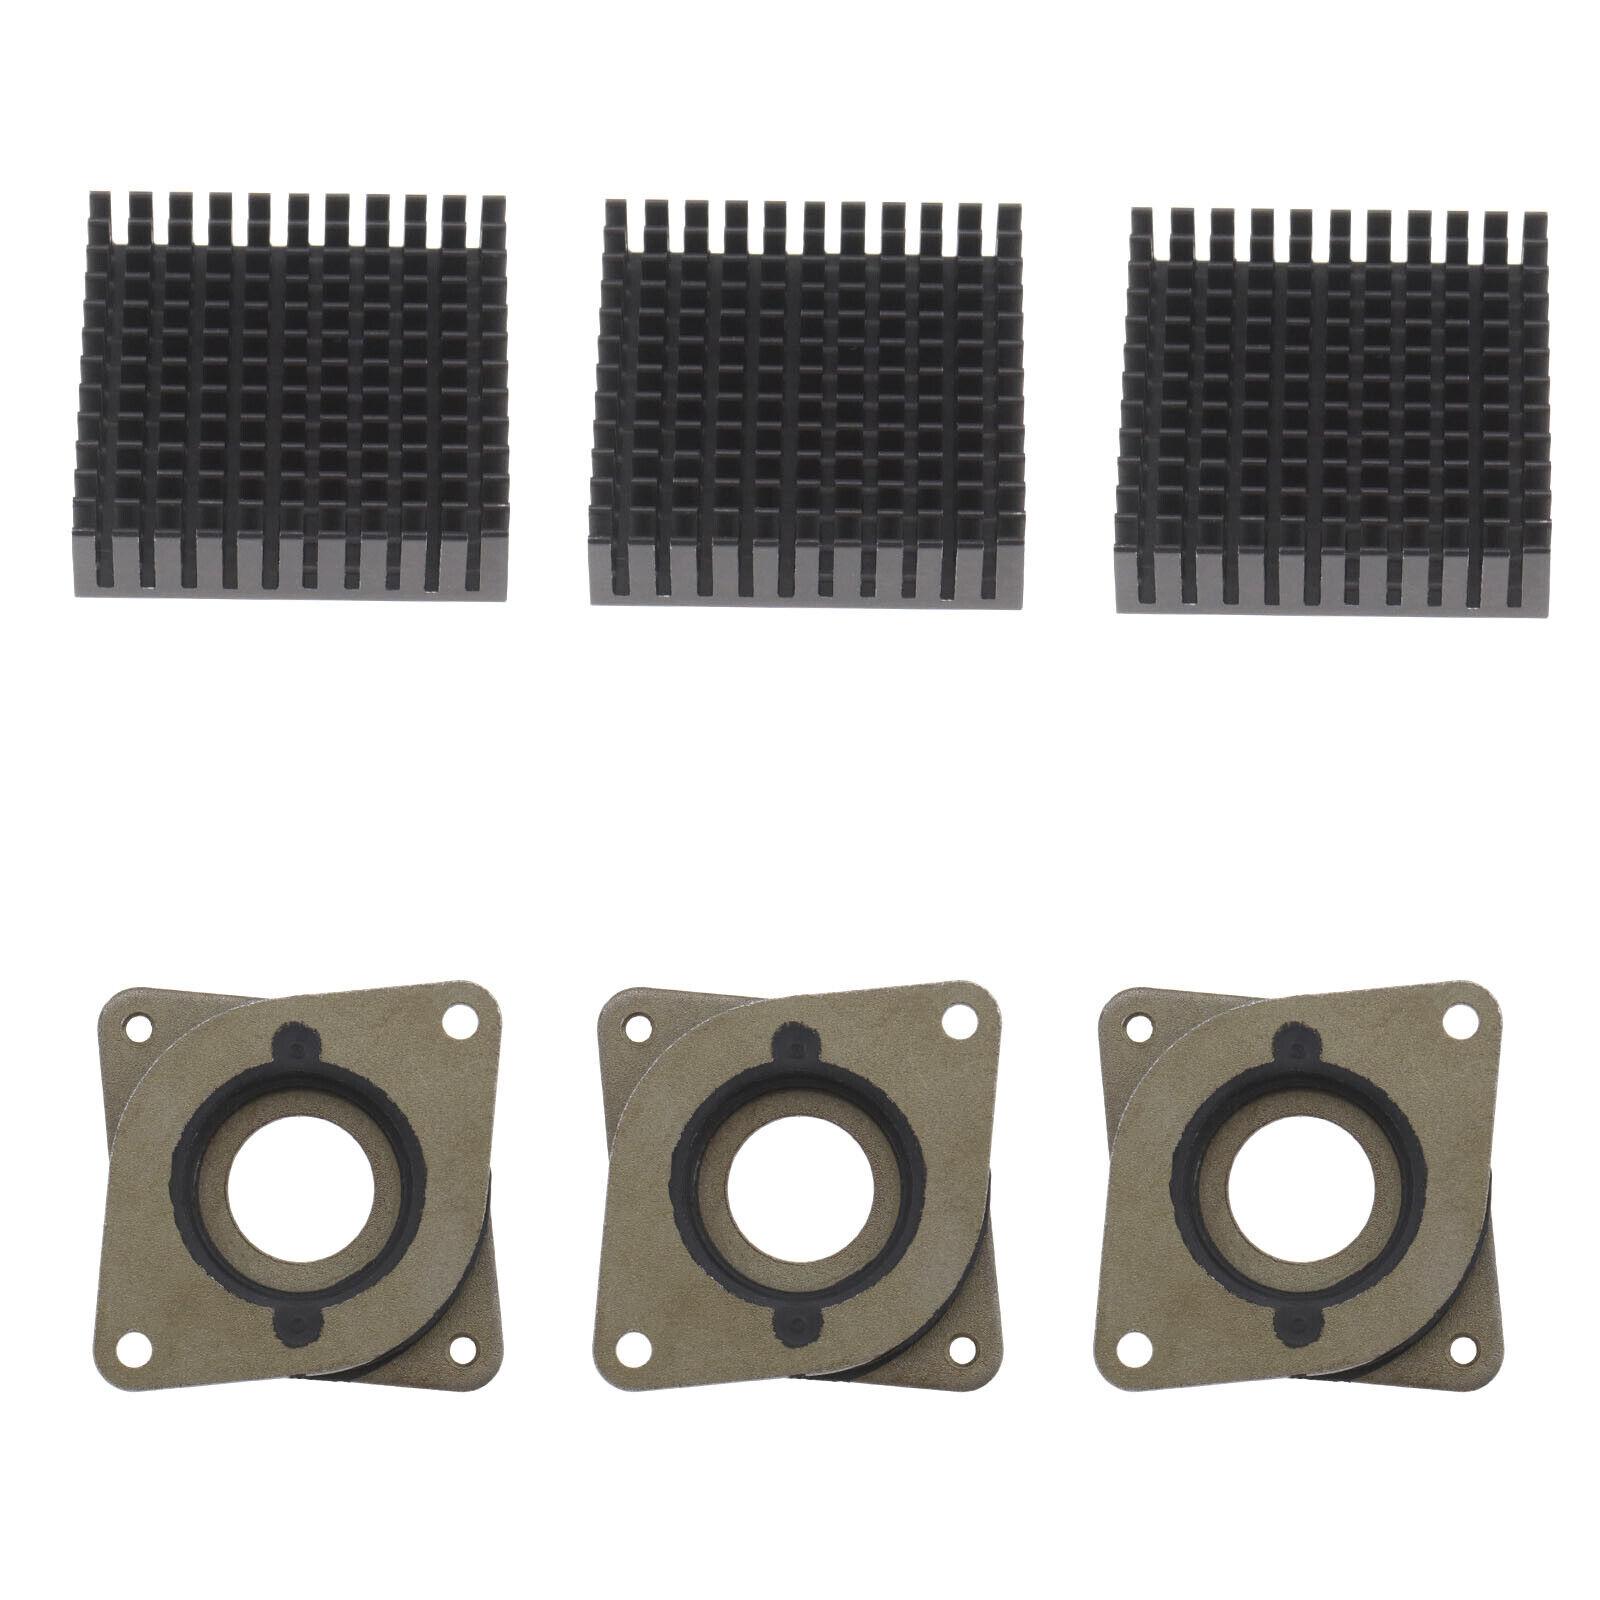 3Pcs 3D Printer Motor Repair Kit Compatible with Nema17 Dashpot and Heatsink